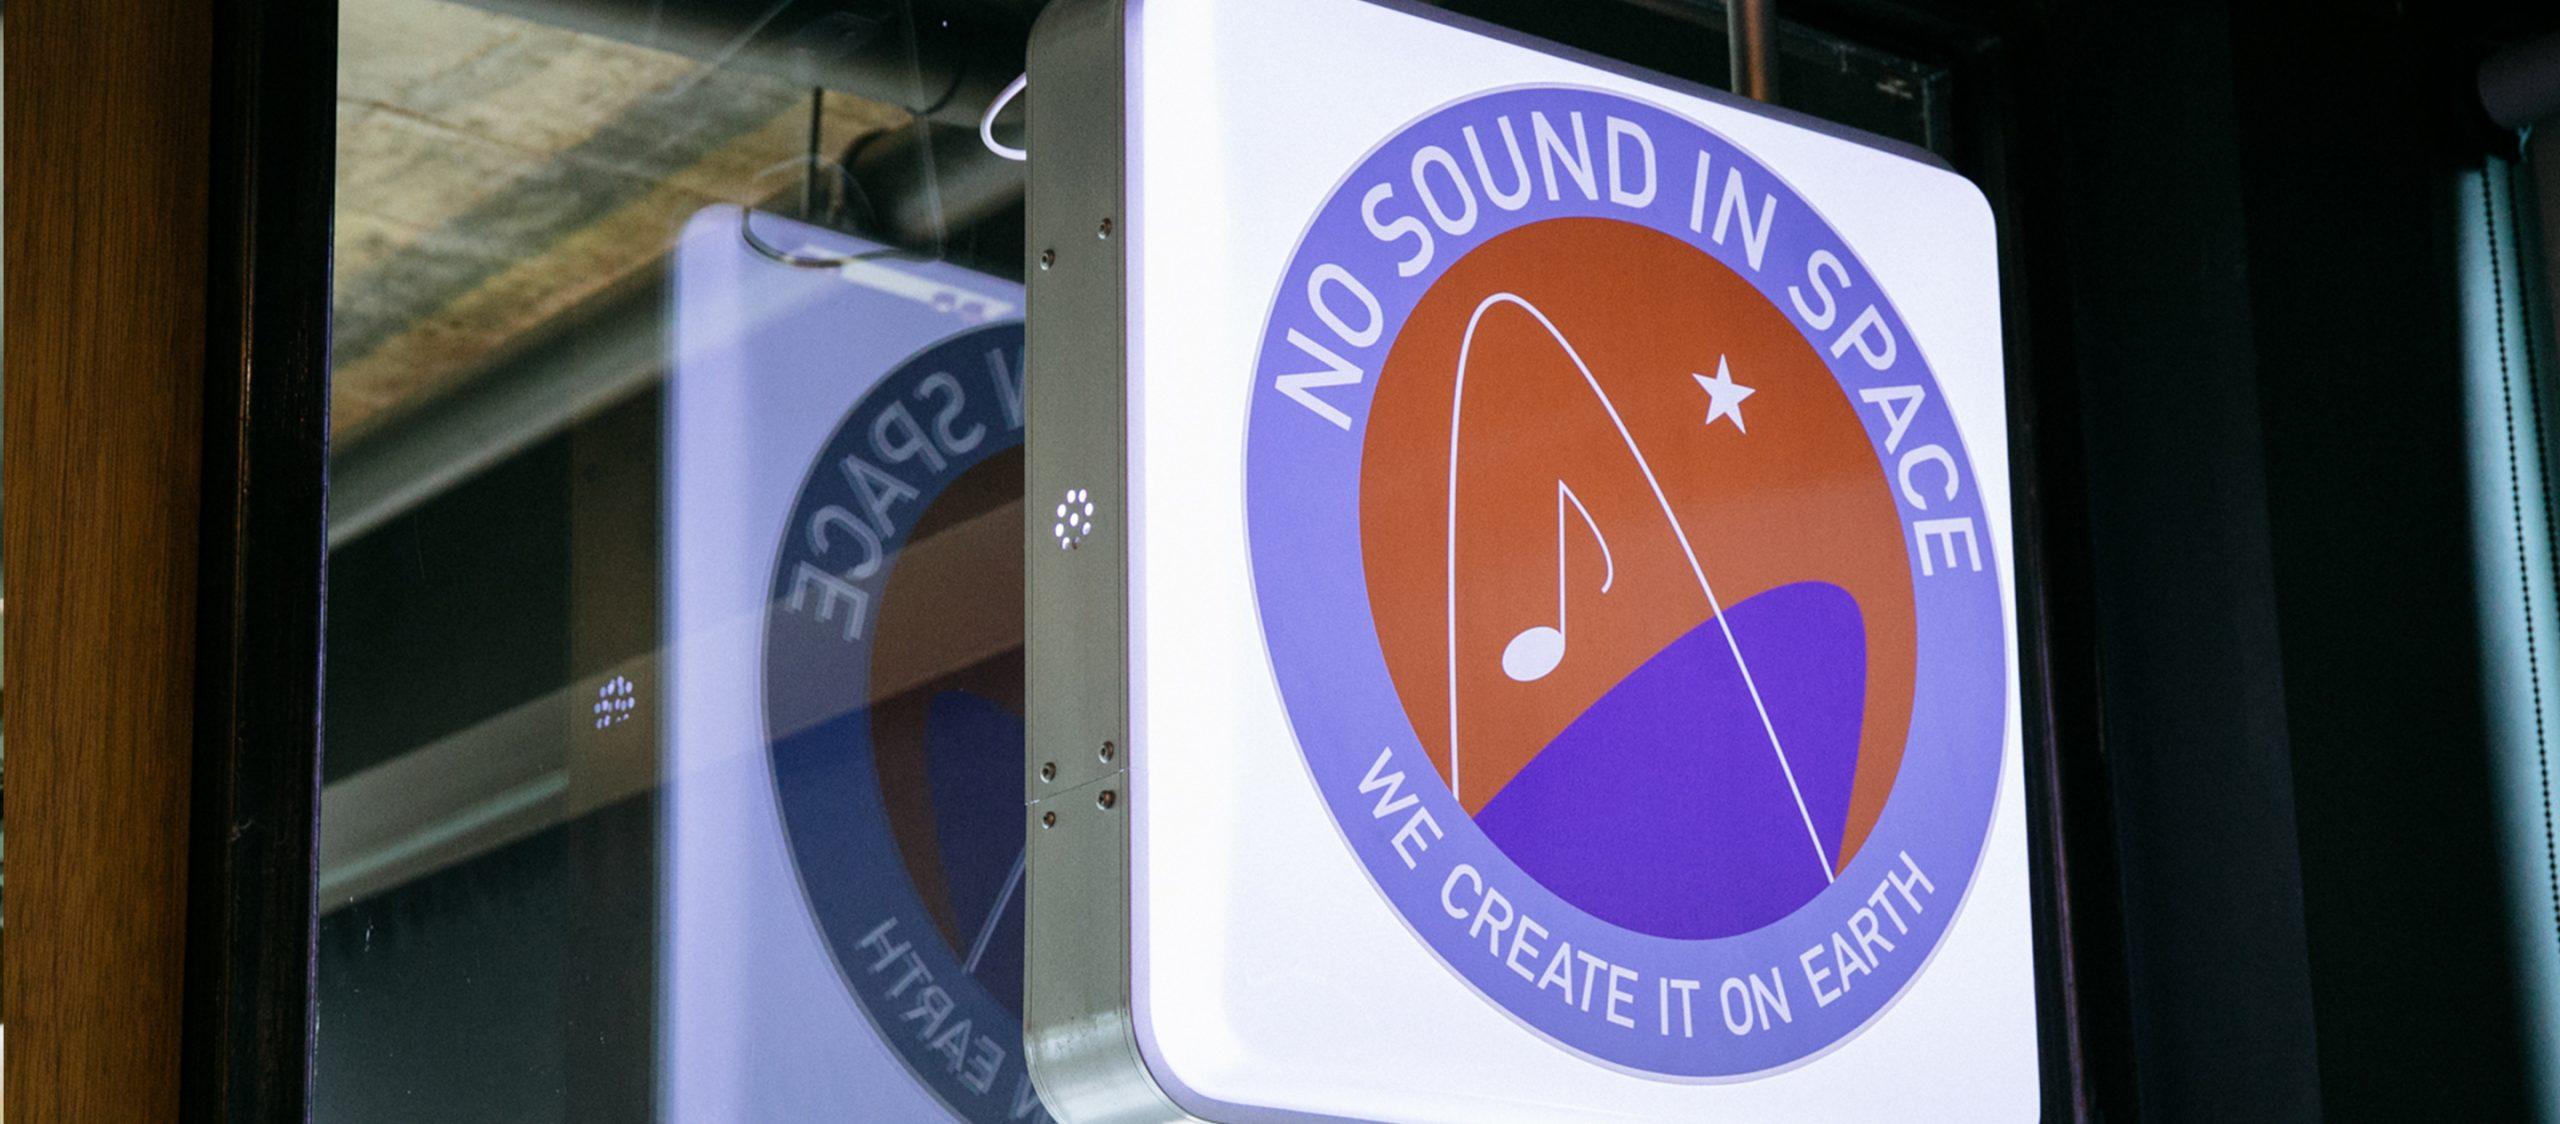 NO SOUND IN SPACE สตูดิโอทำเพลง ความสุขที่ดีไซน์เองของตั้ม โมโนโทน